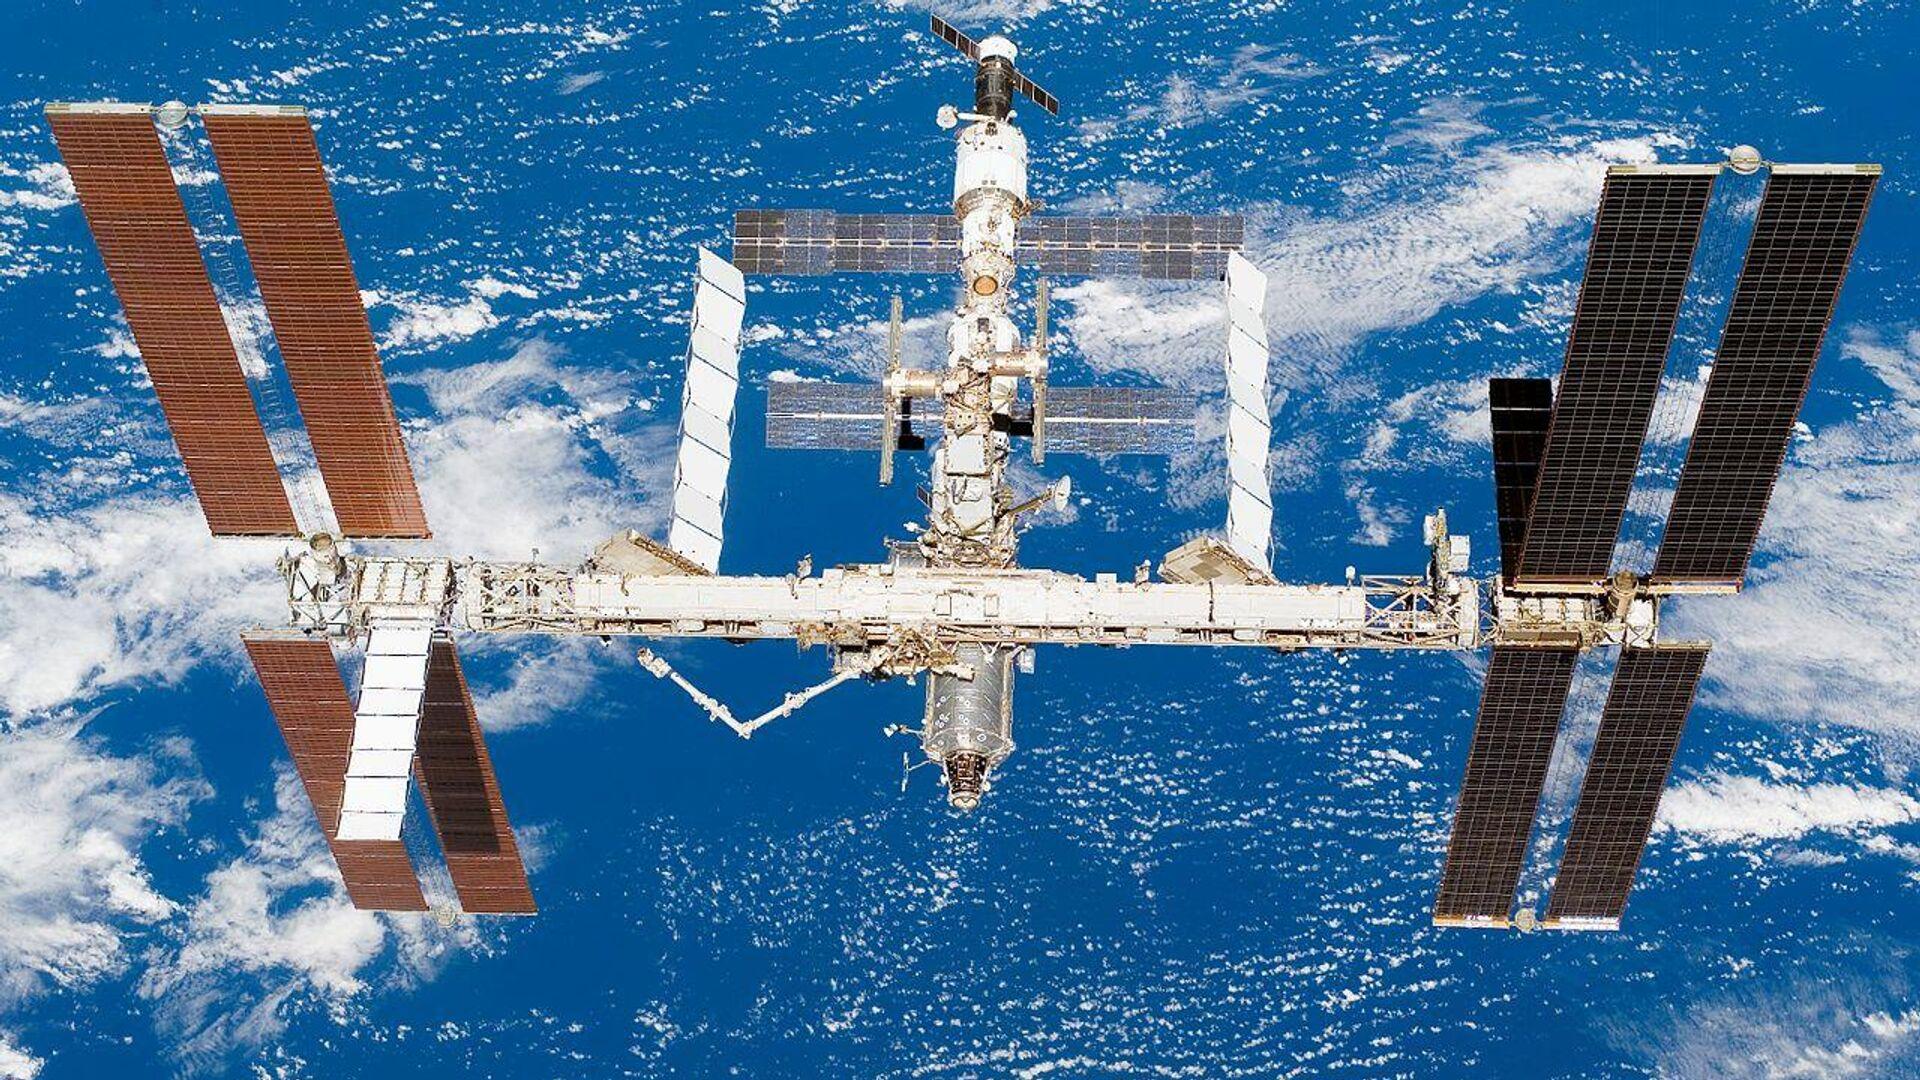 Internationale Raumfahrtstation (ISS) - SNA, 1920, 30.09.2021